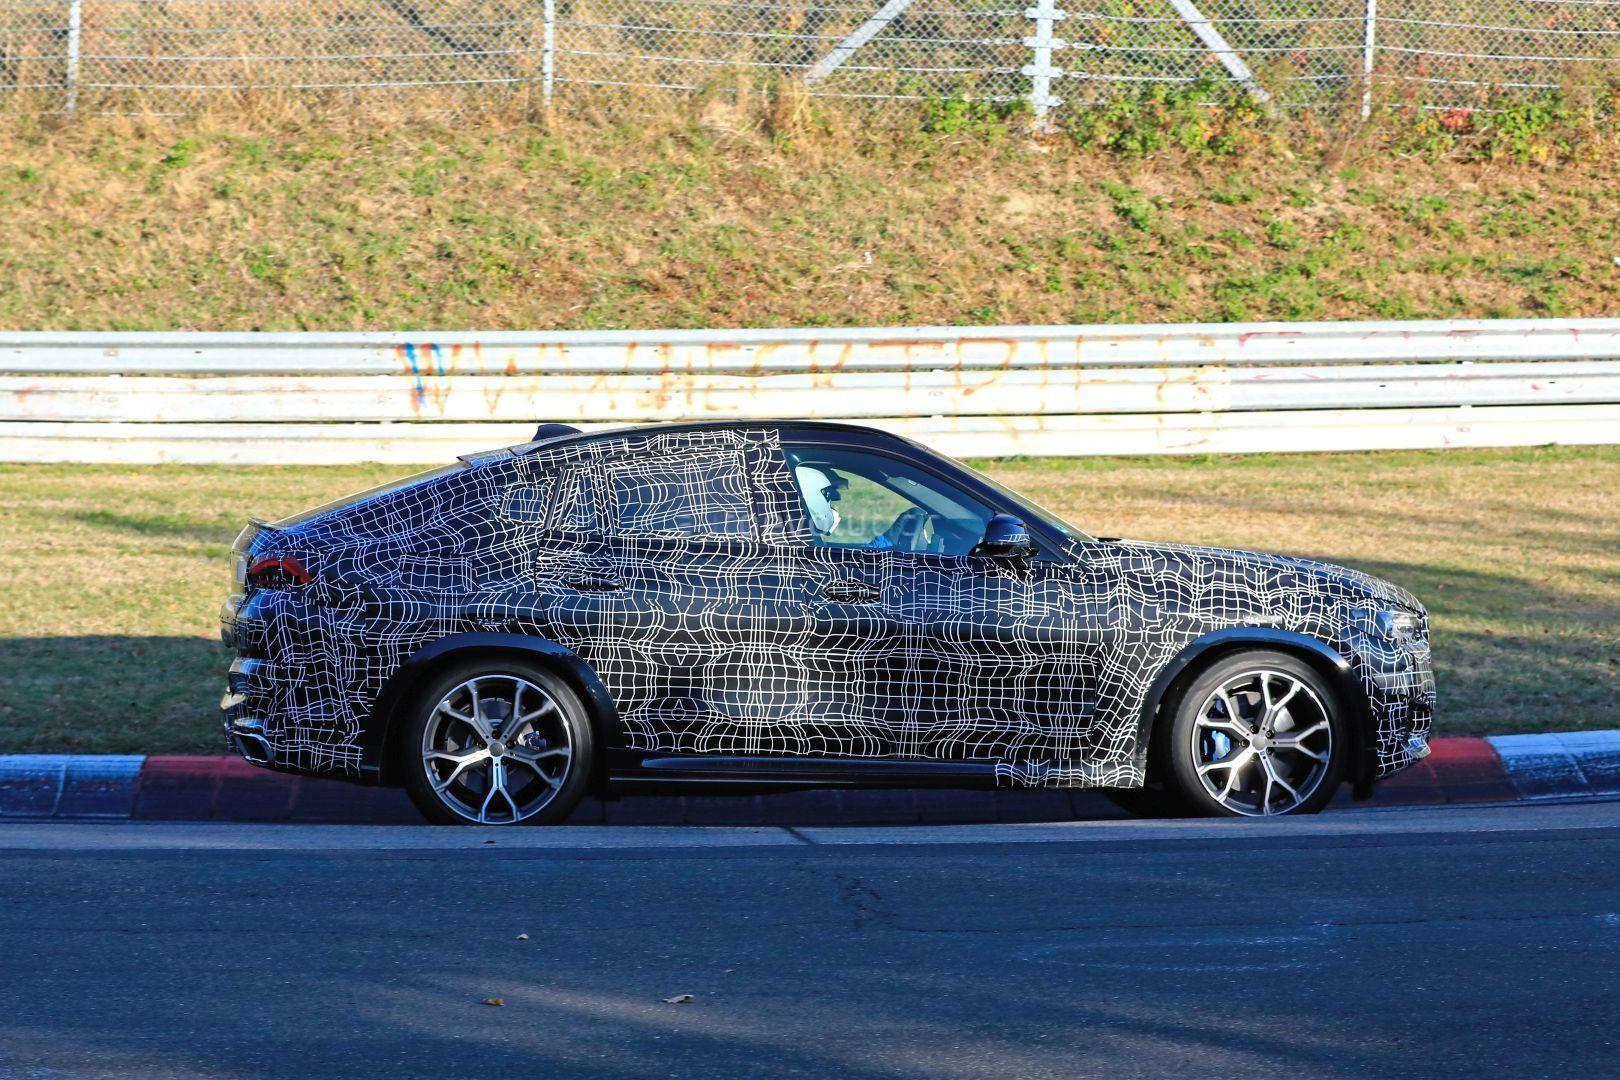 2020-bmw-x6-laps-nurburgring-prototype-reveals-sharper-look_6